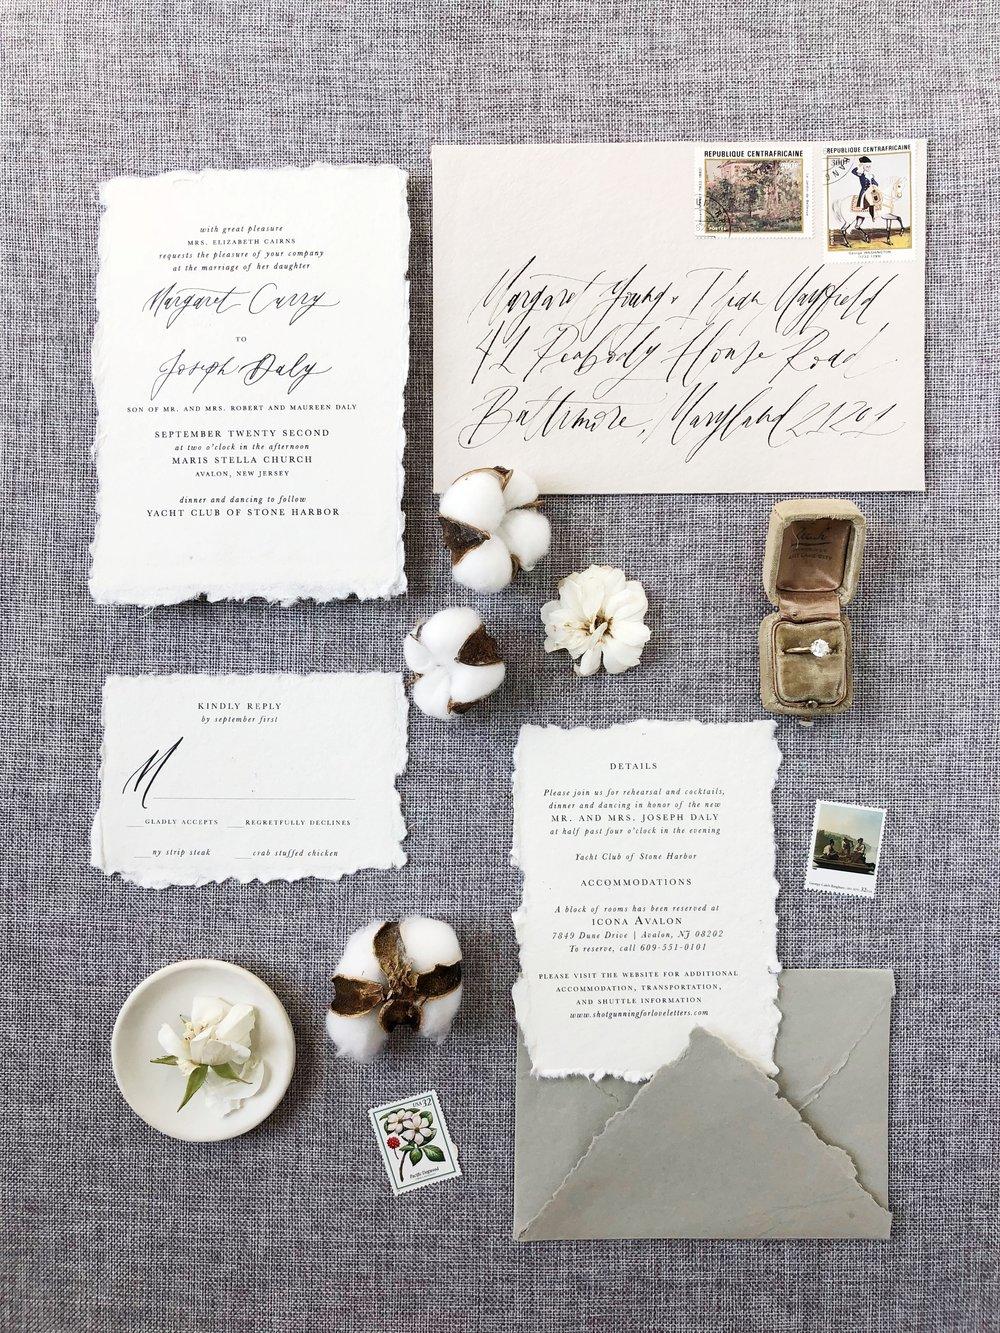 Semi Custom Wedding Invitations | Shotgunning for Love Letters Calligraphy